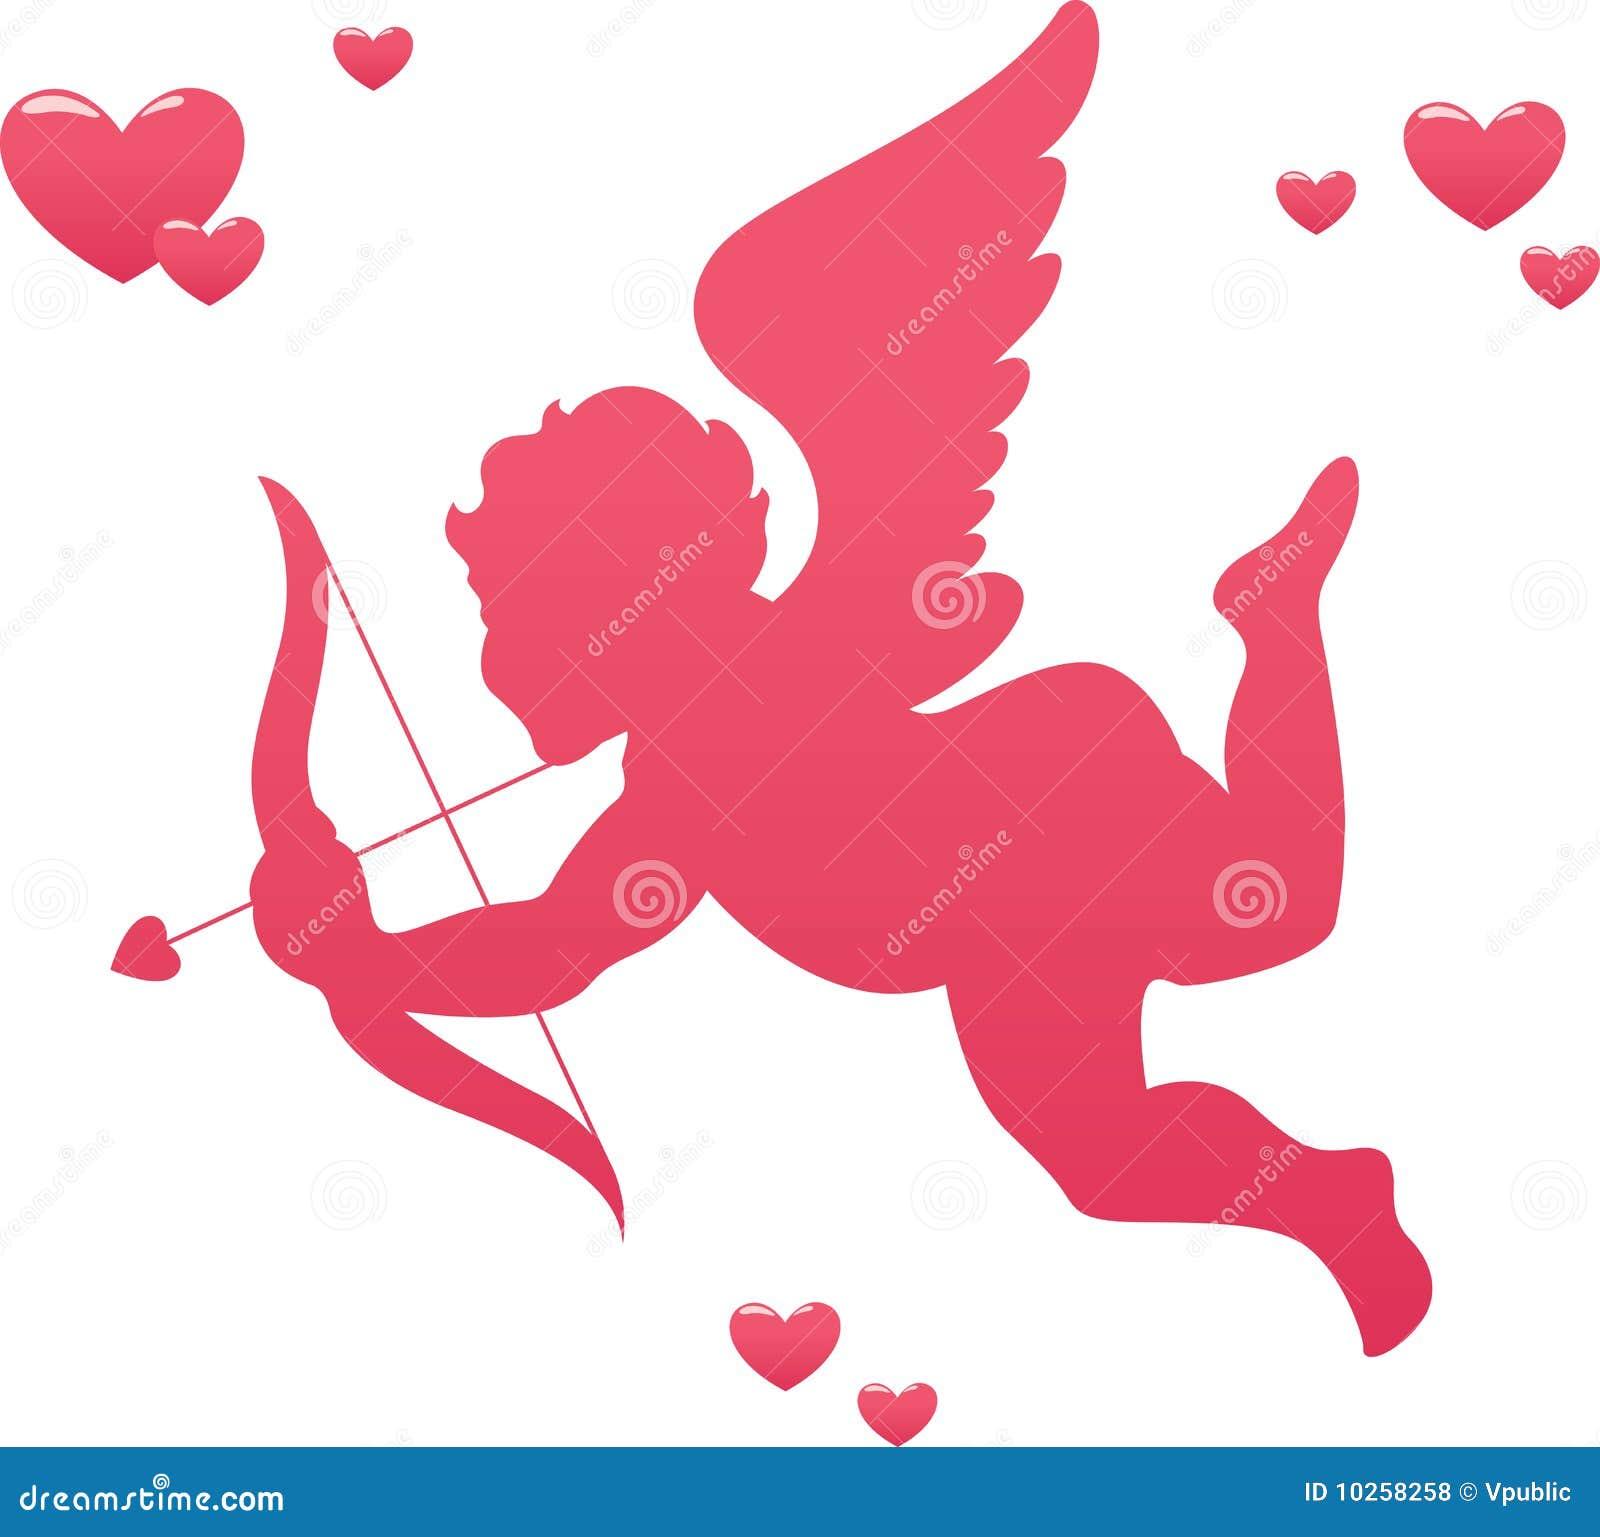 Love Cupid Royalty Free Stock Photos - Image: 10258258